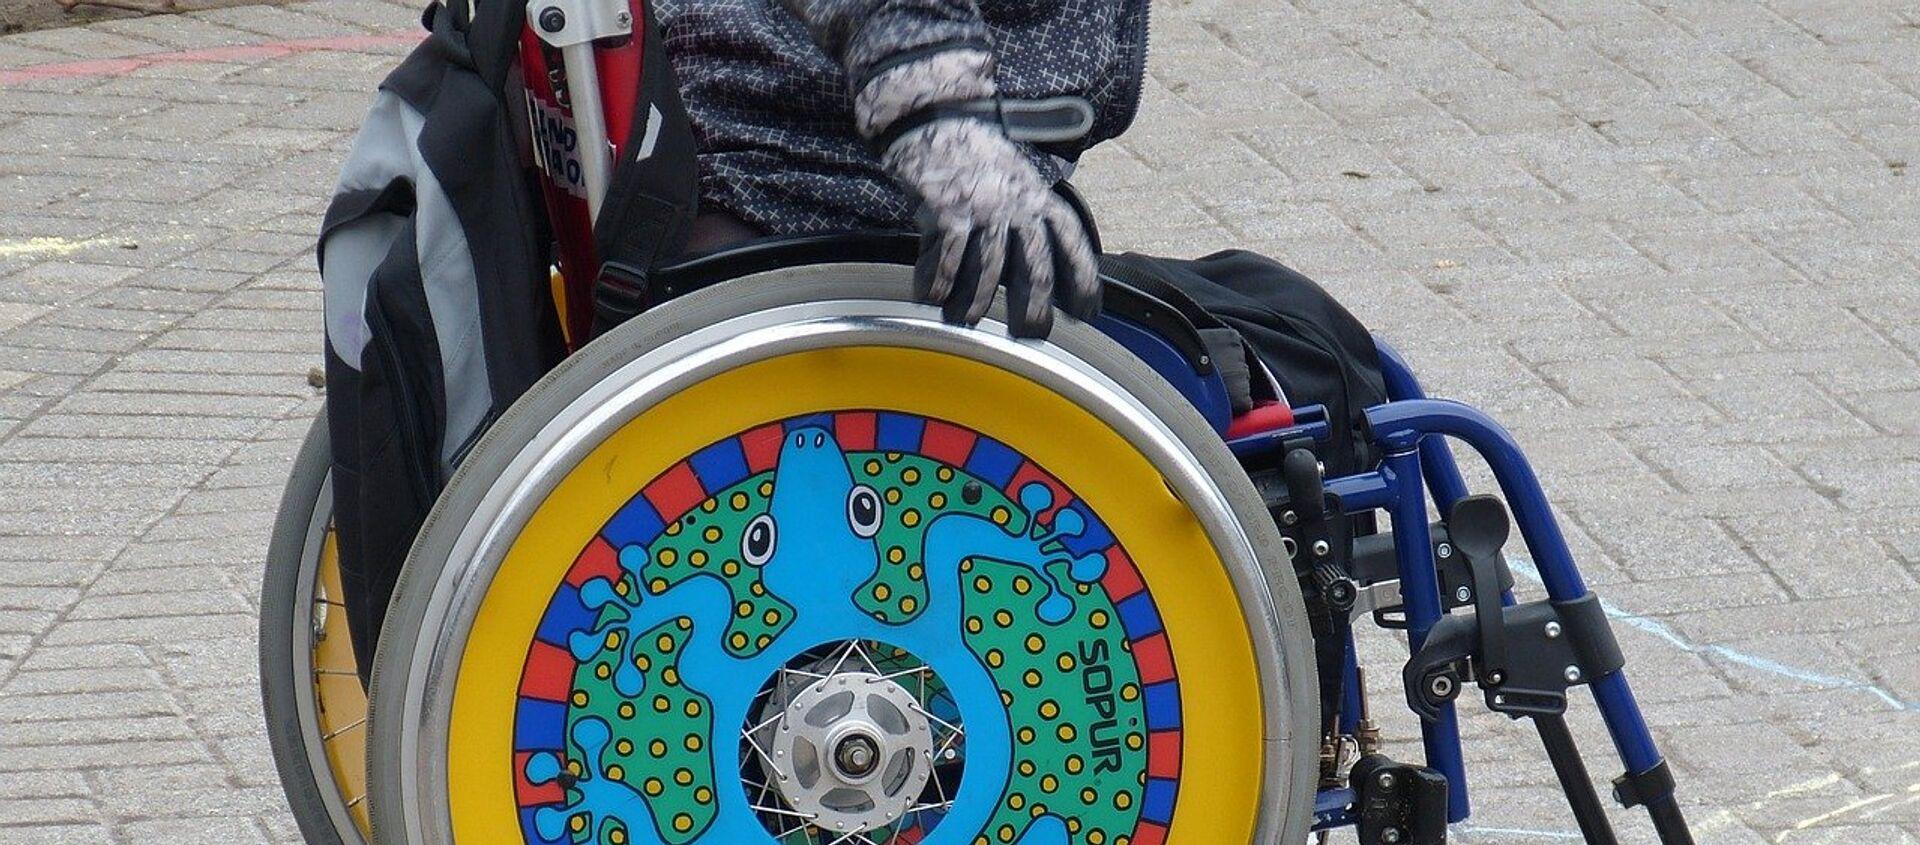 Una persona discapacitada - Sputnik Mundo, 1920, 03.12.2017